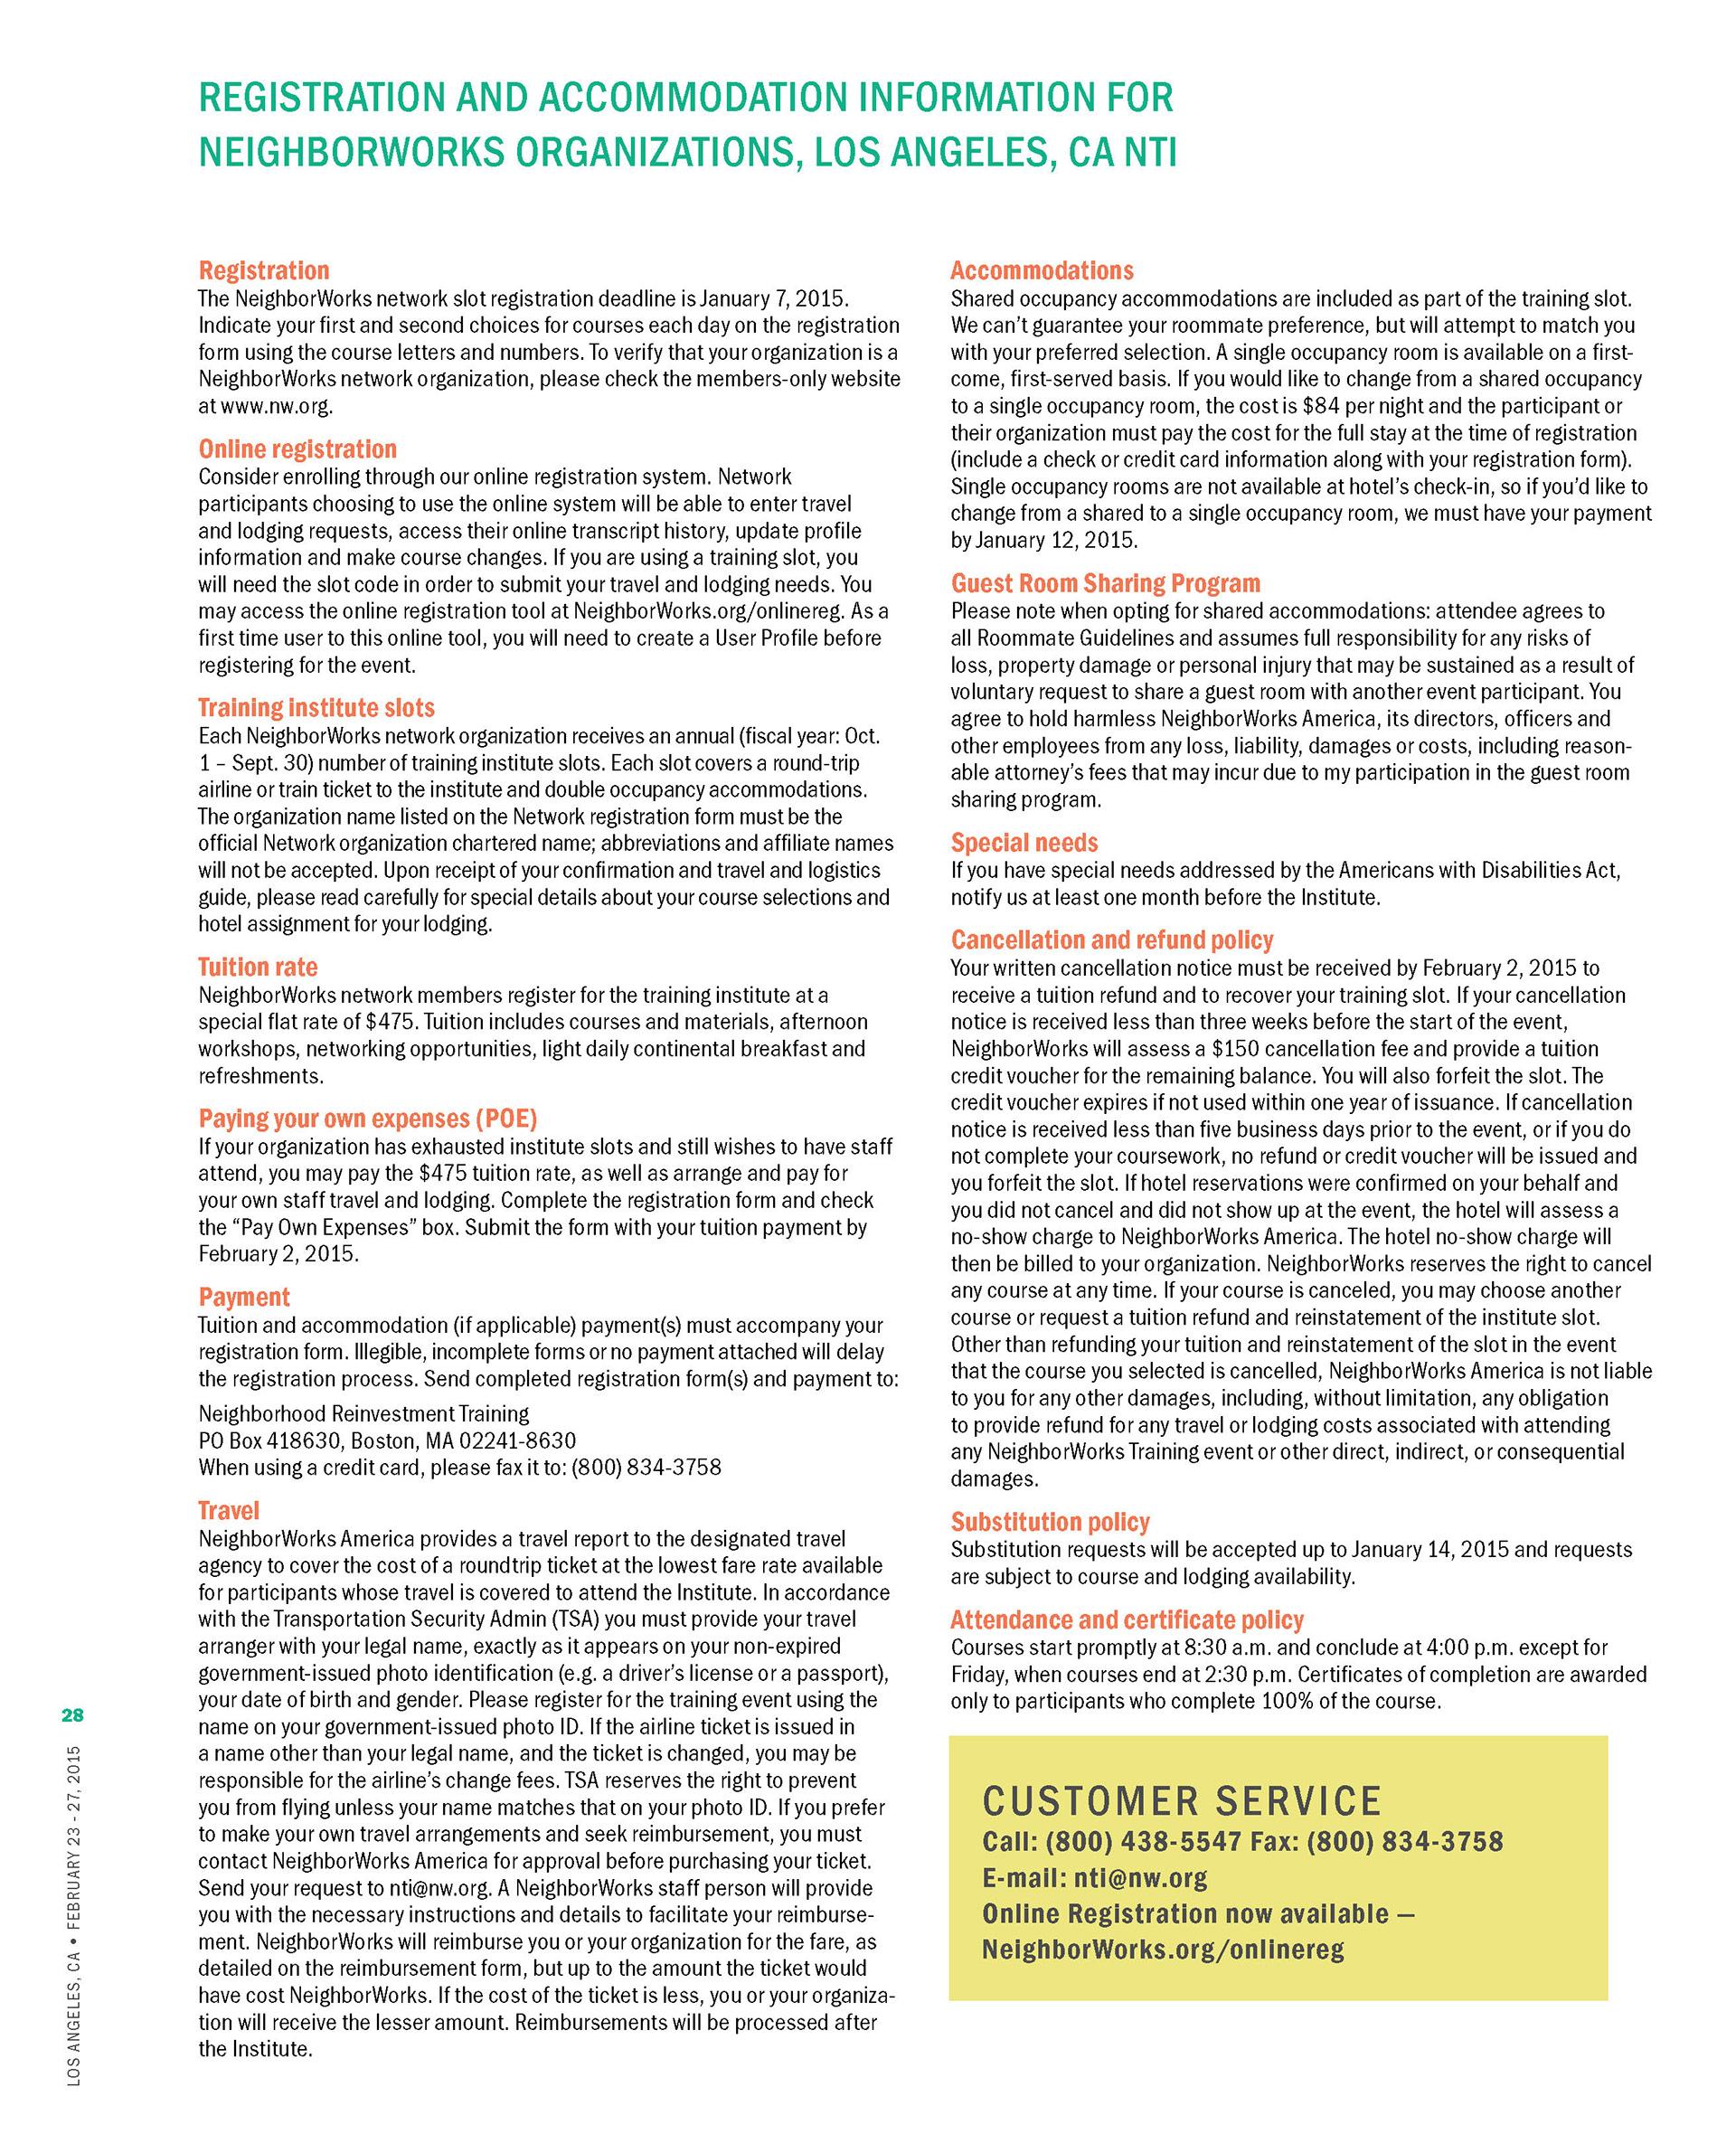 Design powers neighborworks training institute brochure la 2015 nw training institute brochure for los angeles event xflitez Choice Image